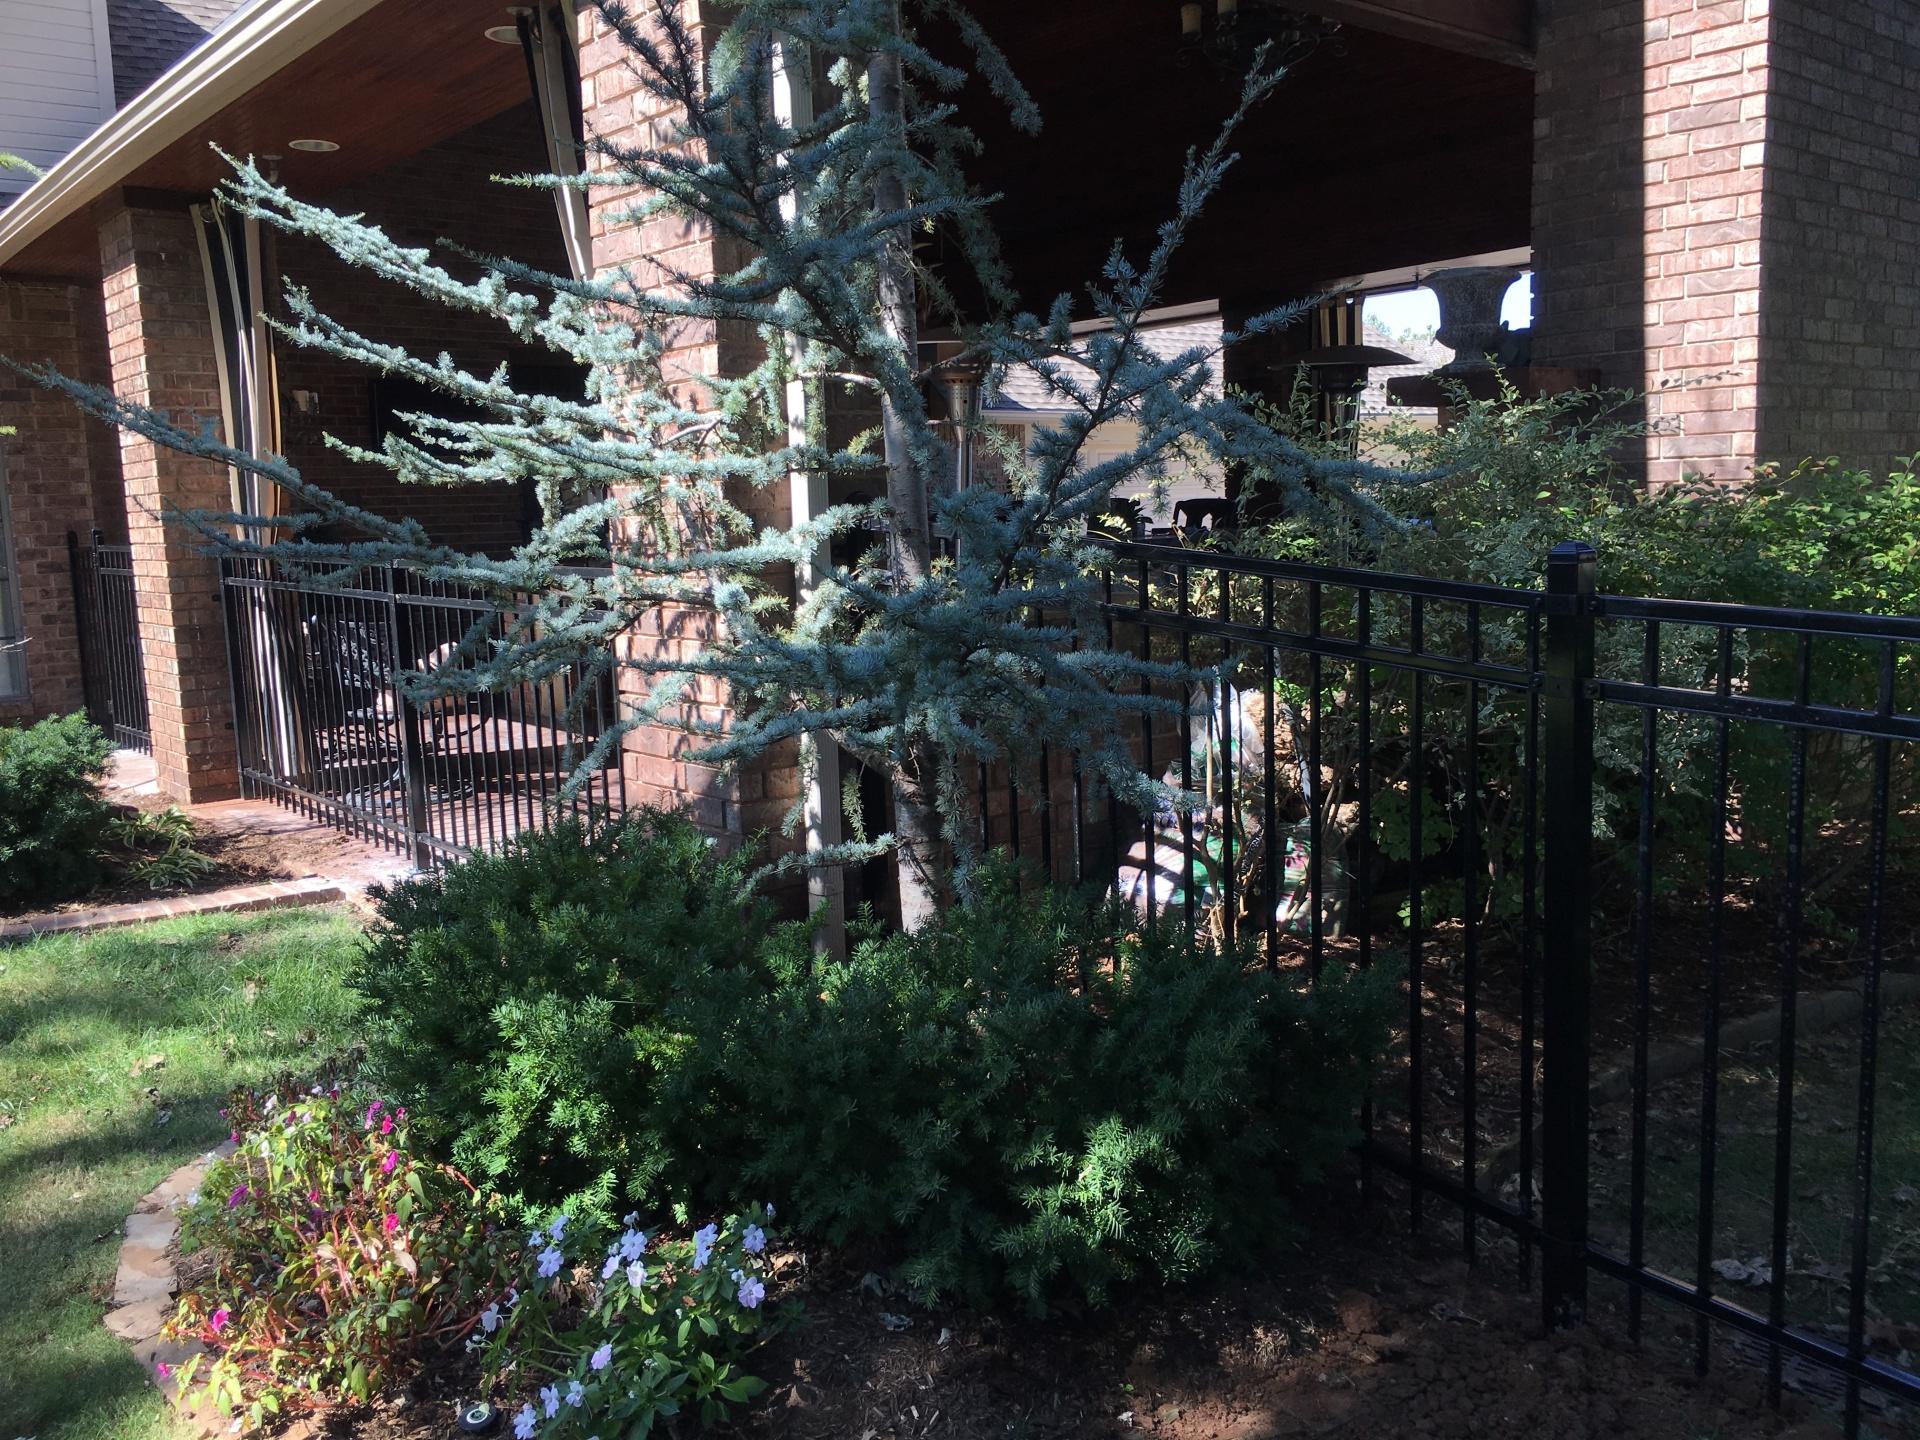 Oklahoma fence company, Edmond Fence Company, Iron Fence, Secure Fence, Security, Elegant Fence, Safe Fence, Fencing